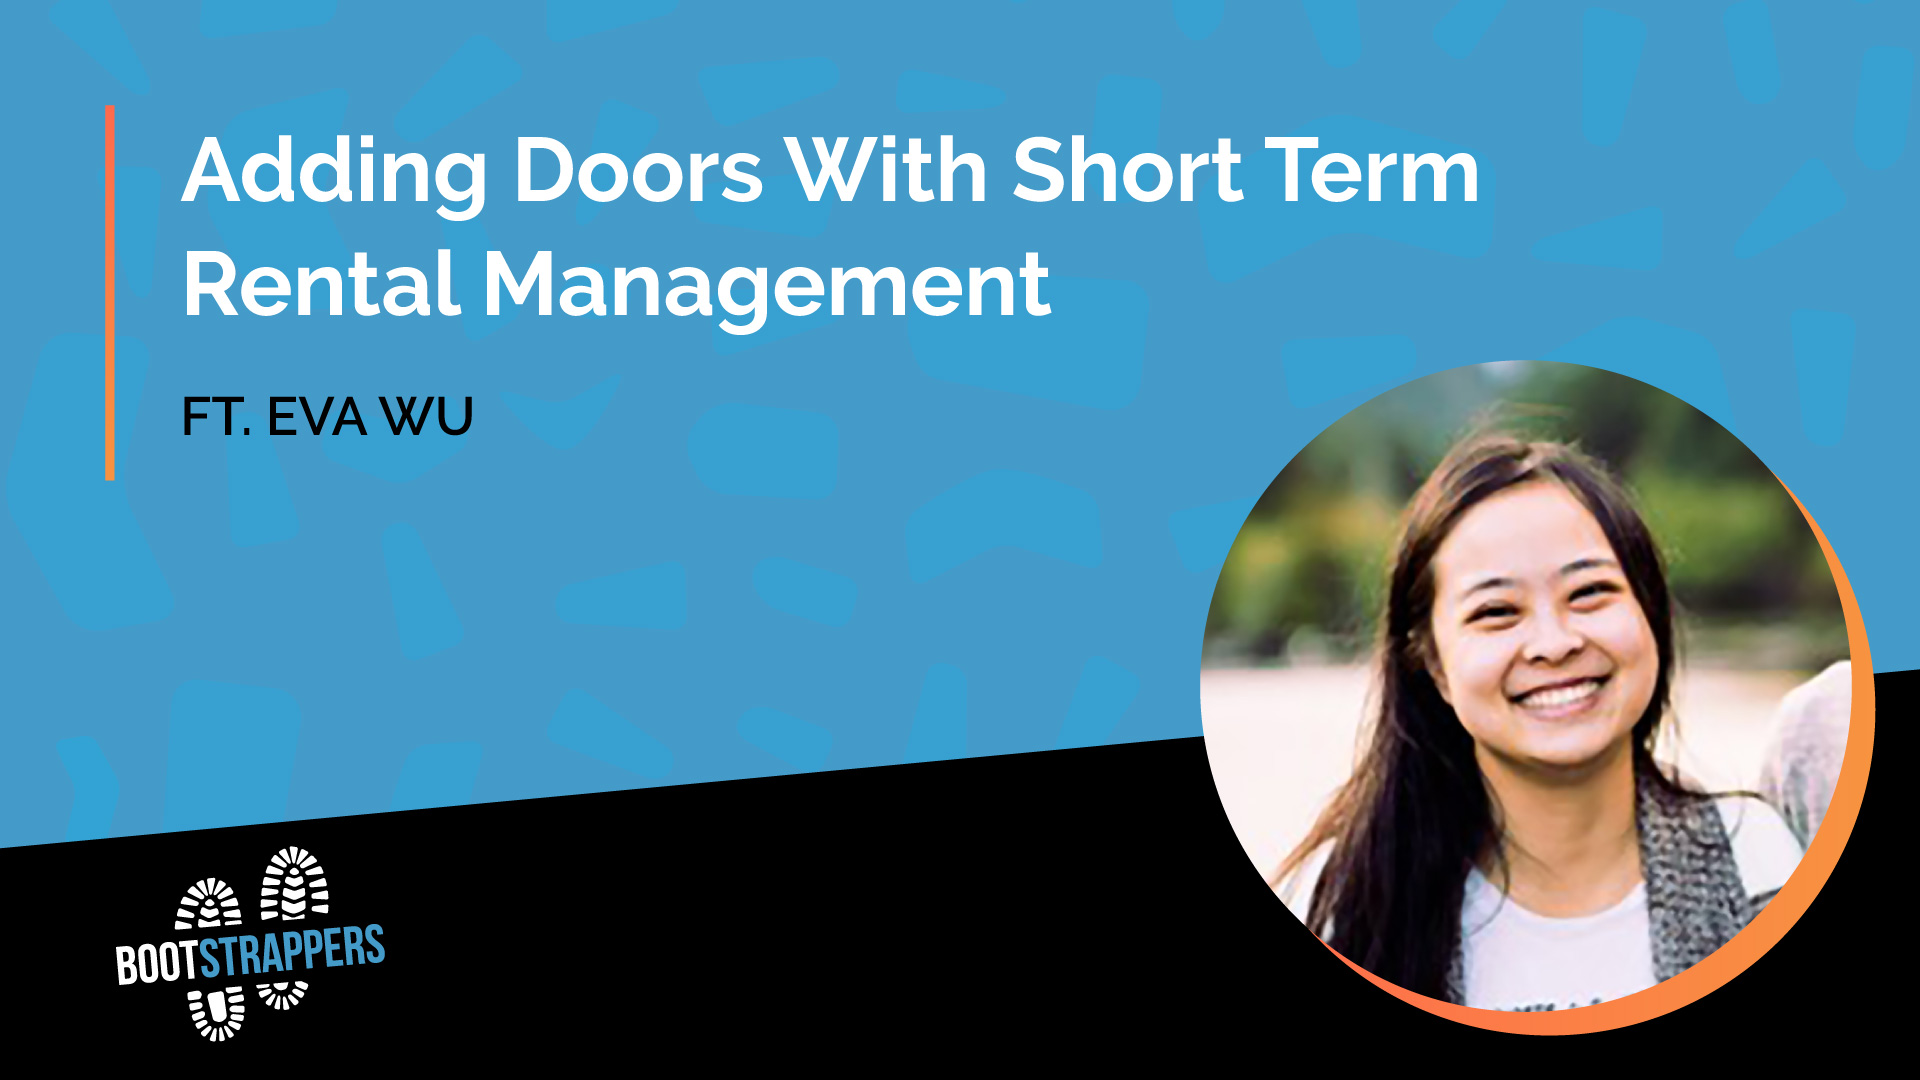 adding-doors-with-short-term-rental-management